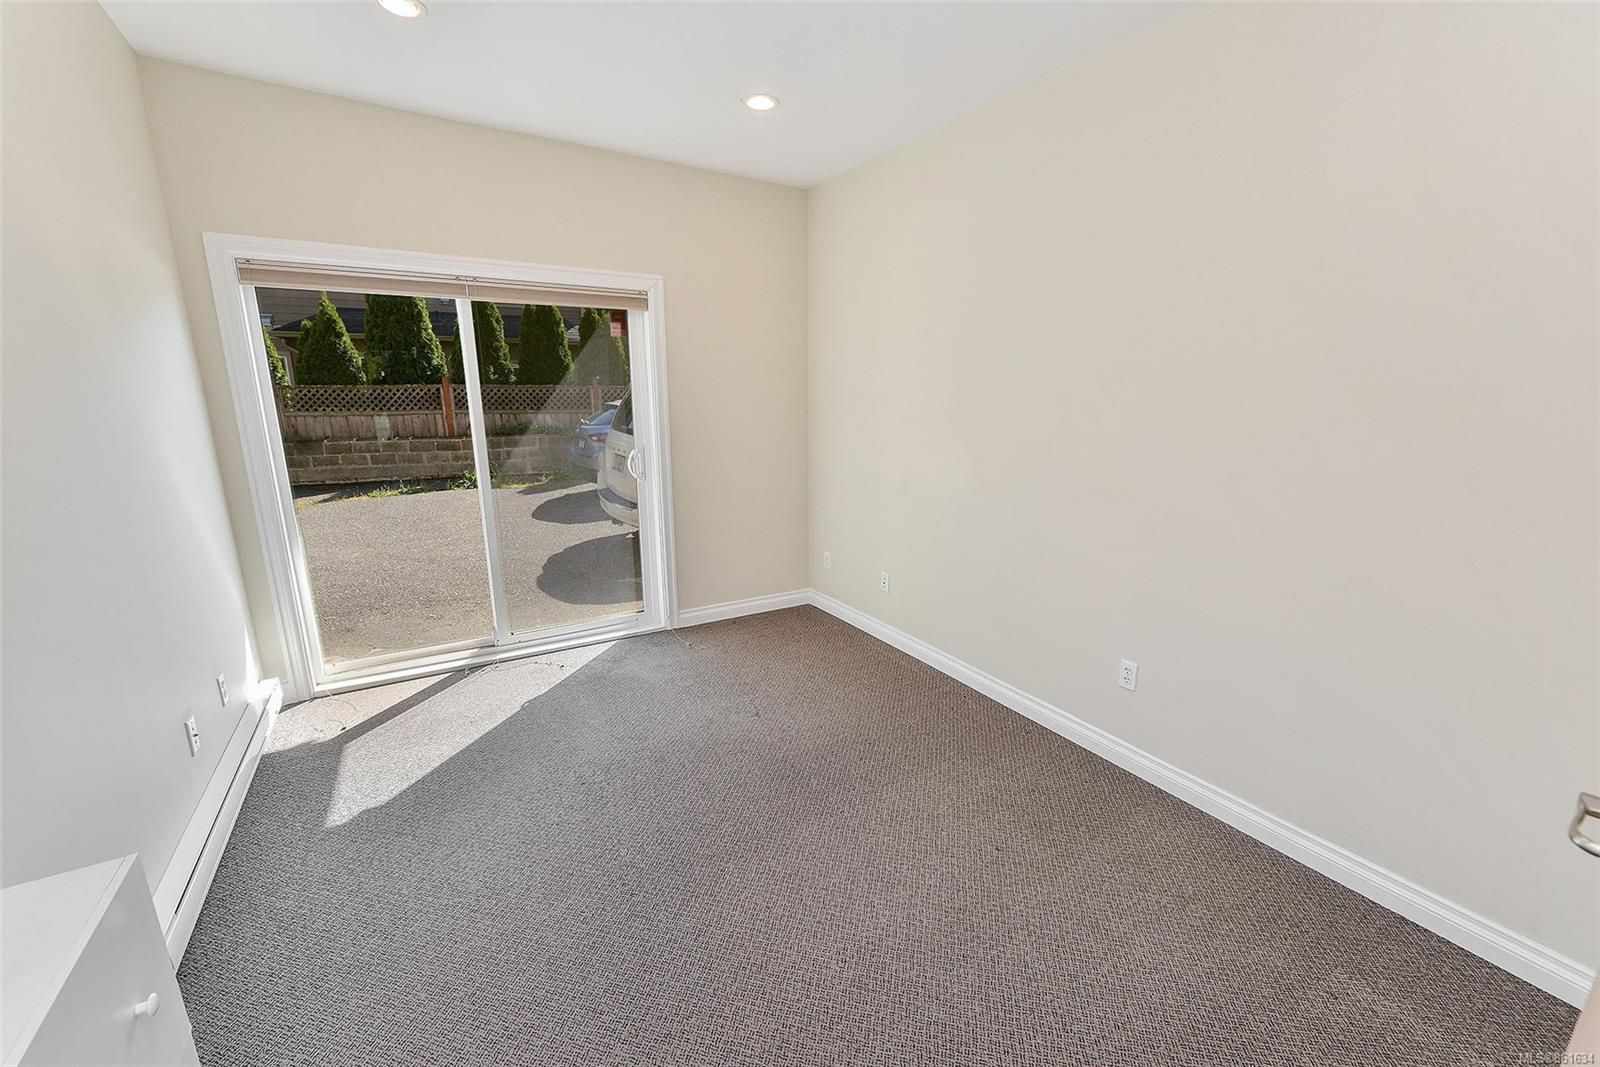 Photo 8: Photos: 367 E Burnside Rd in : Vi Burnside Quadruplex for sale (Victoria)  : MLS®# 861634